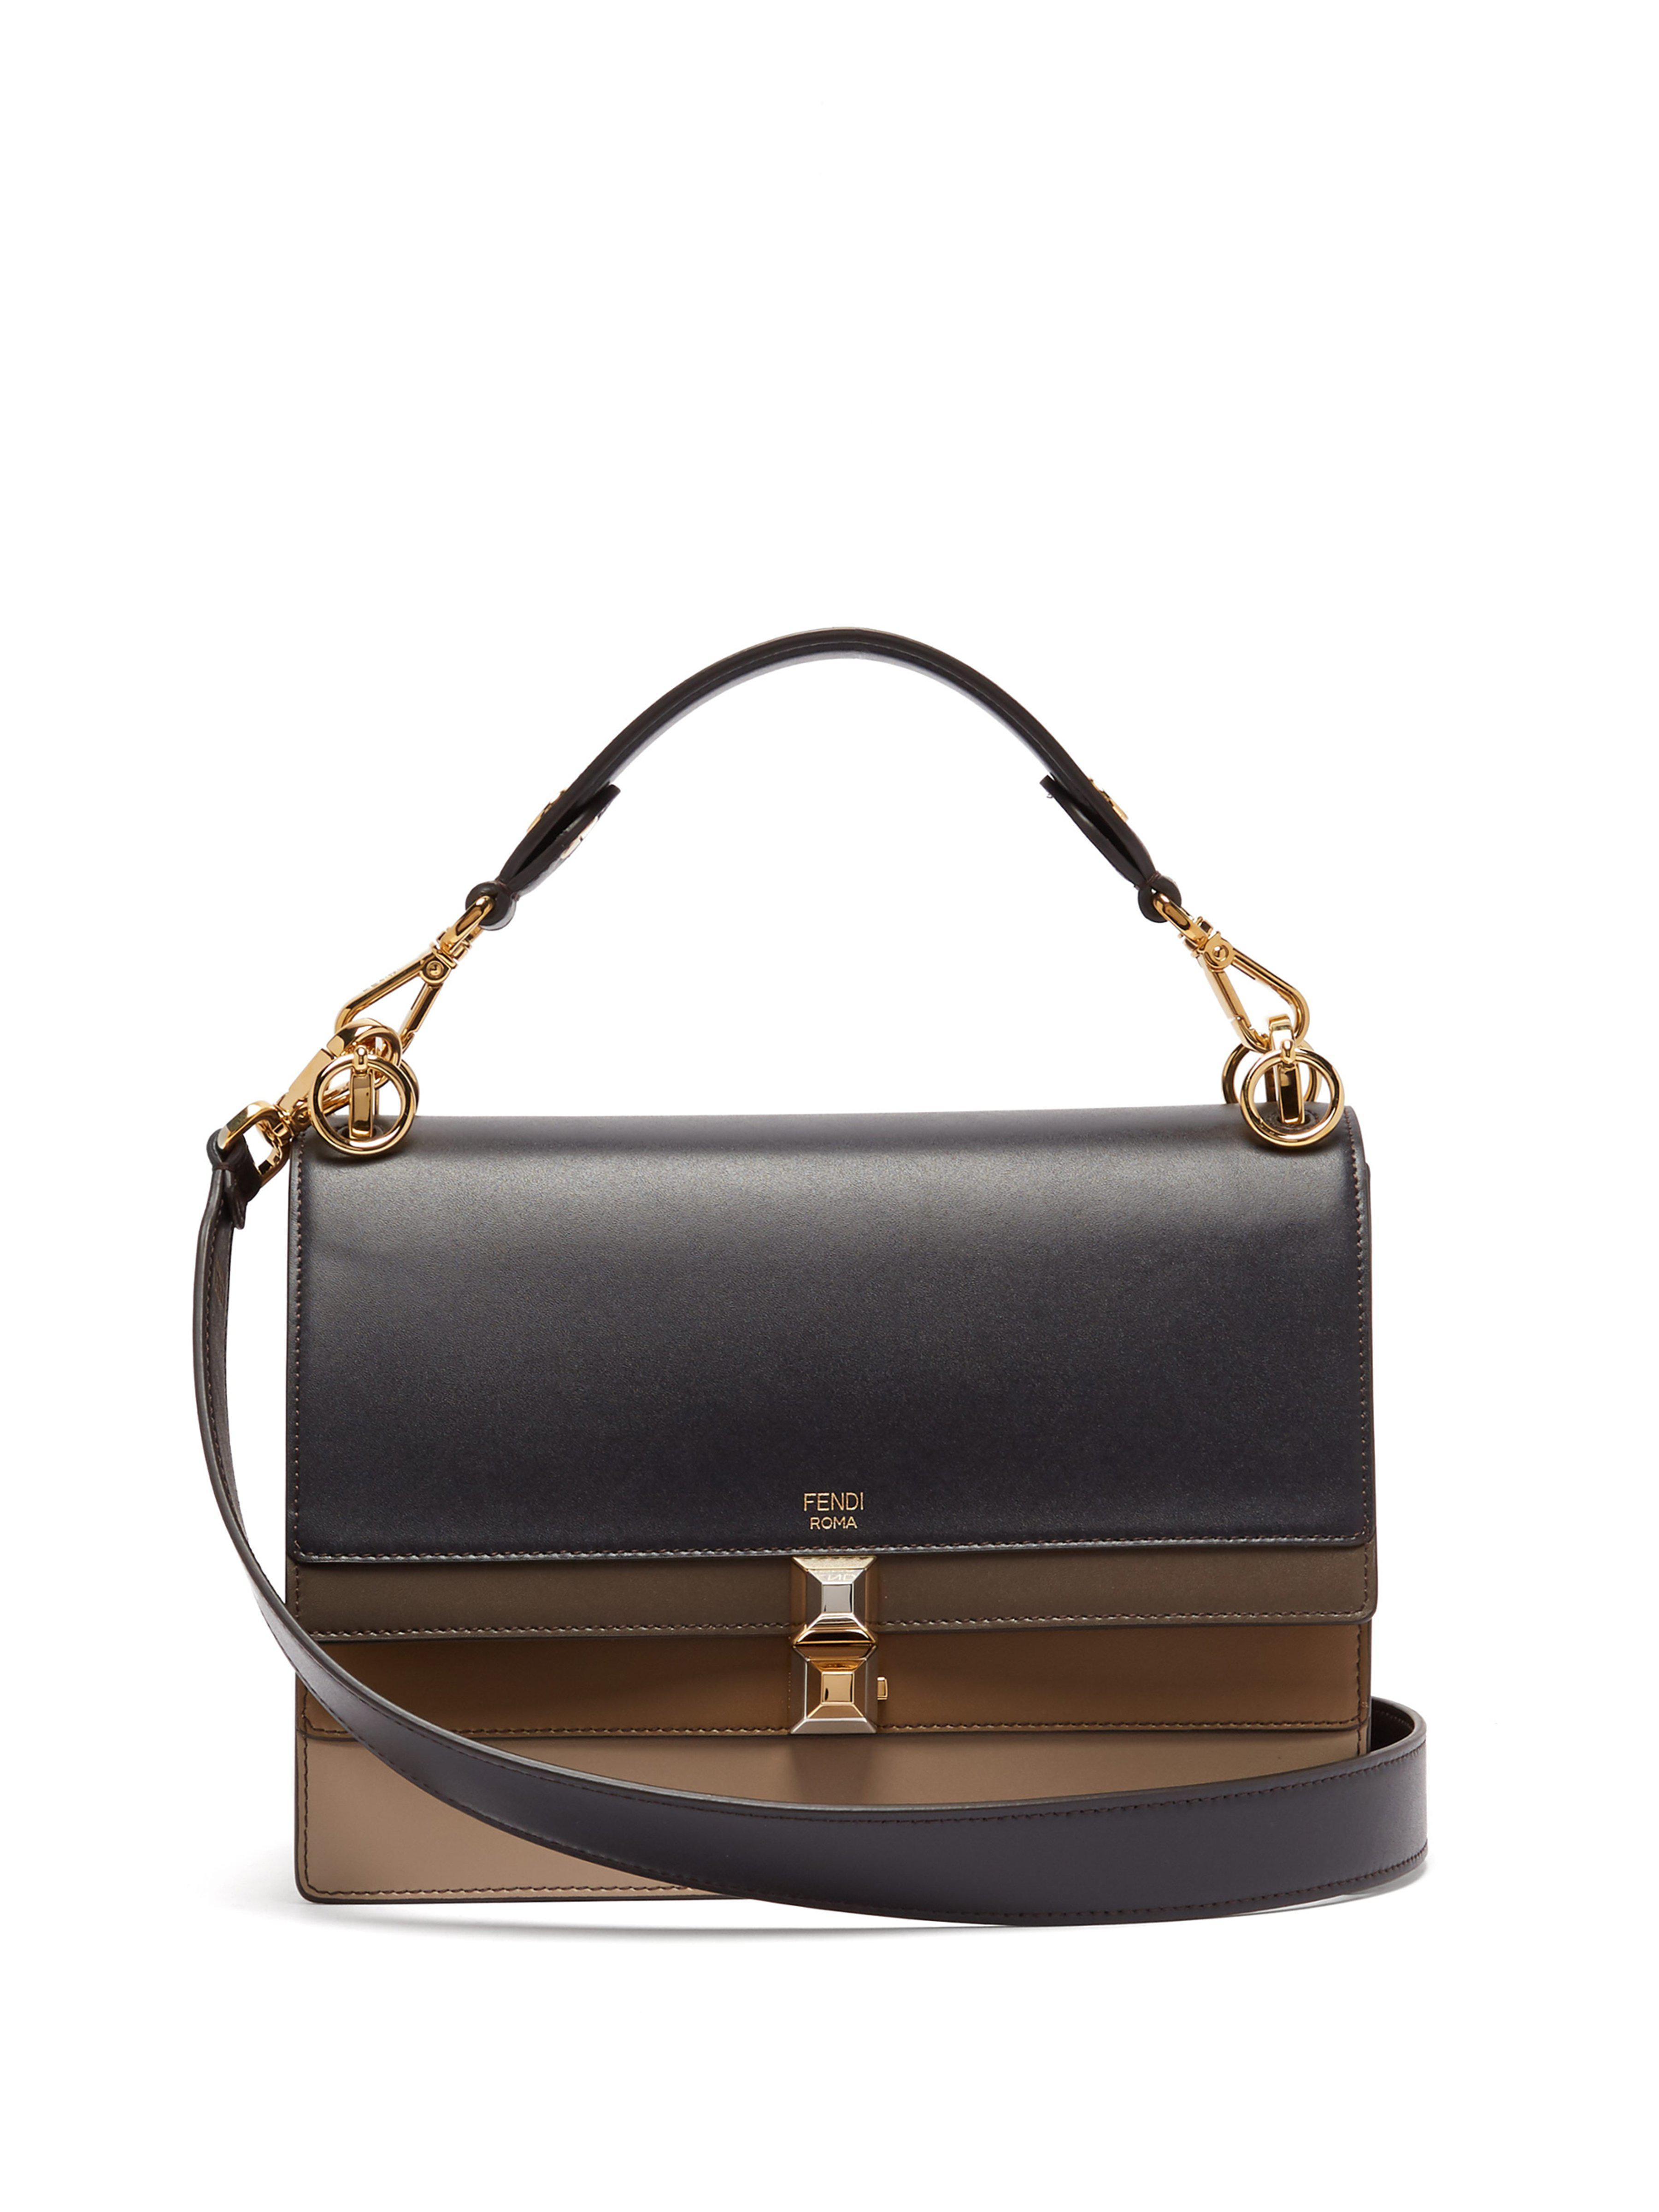 b529c6eb5f4c Fendi Kan I Leather Shoulder Bag in Blue - Lyst